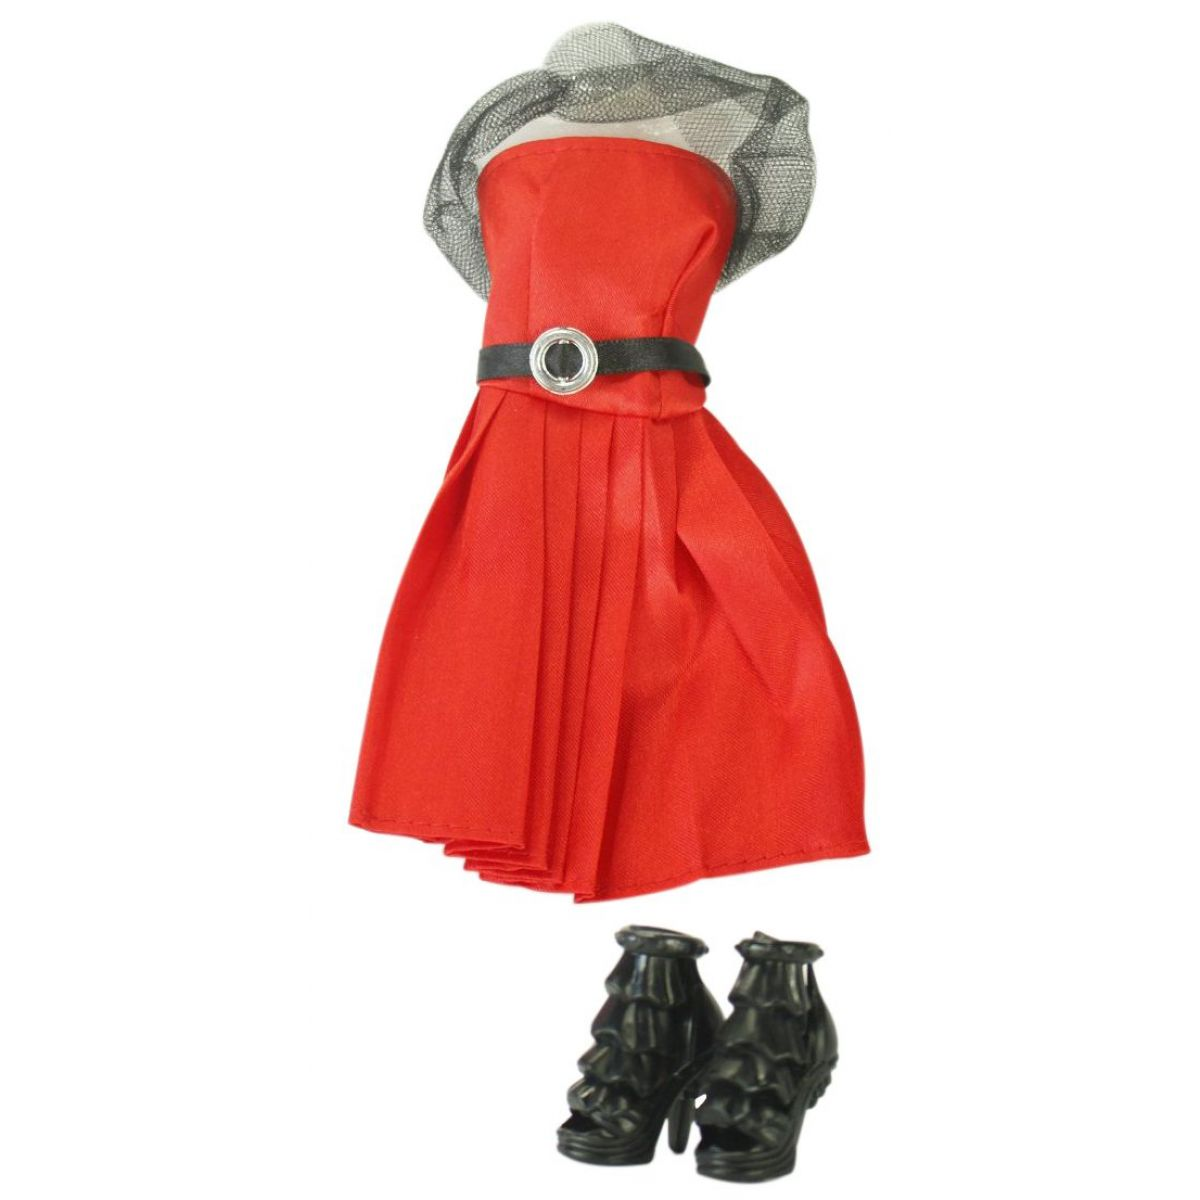 EPline Šatičky pro panenky s doplňky červené šaty s černým páskem